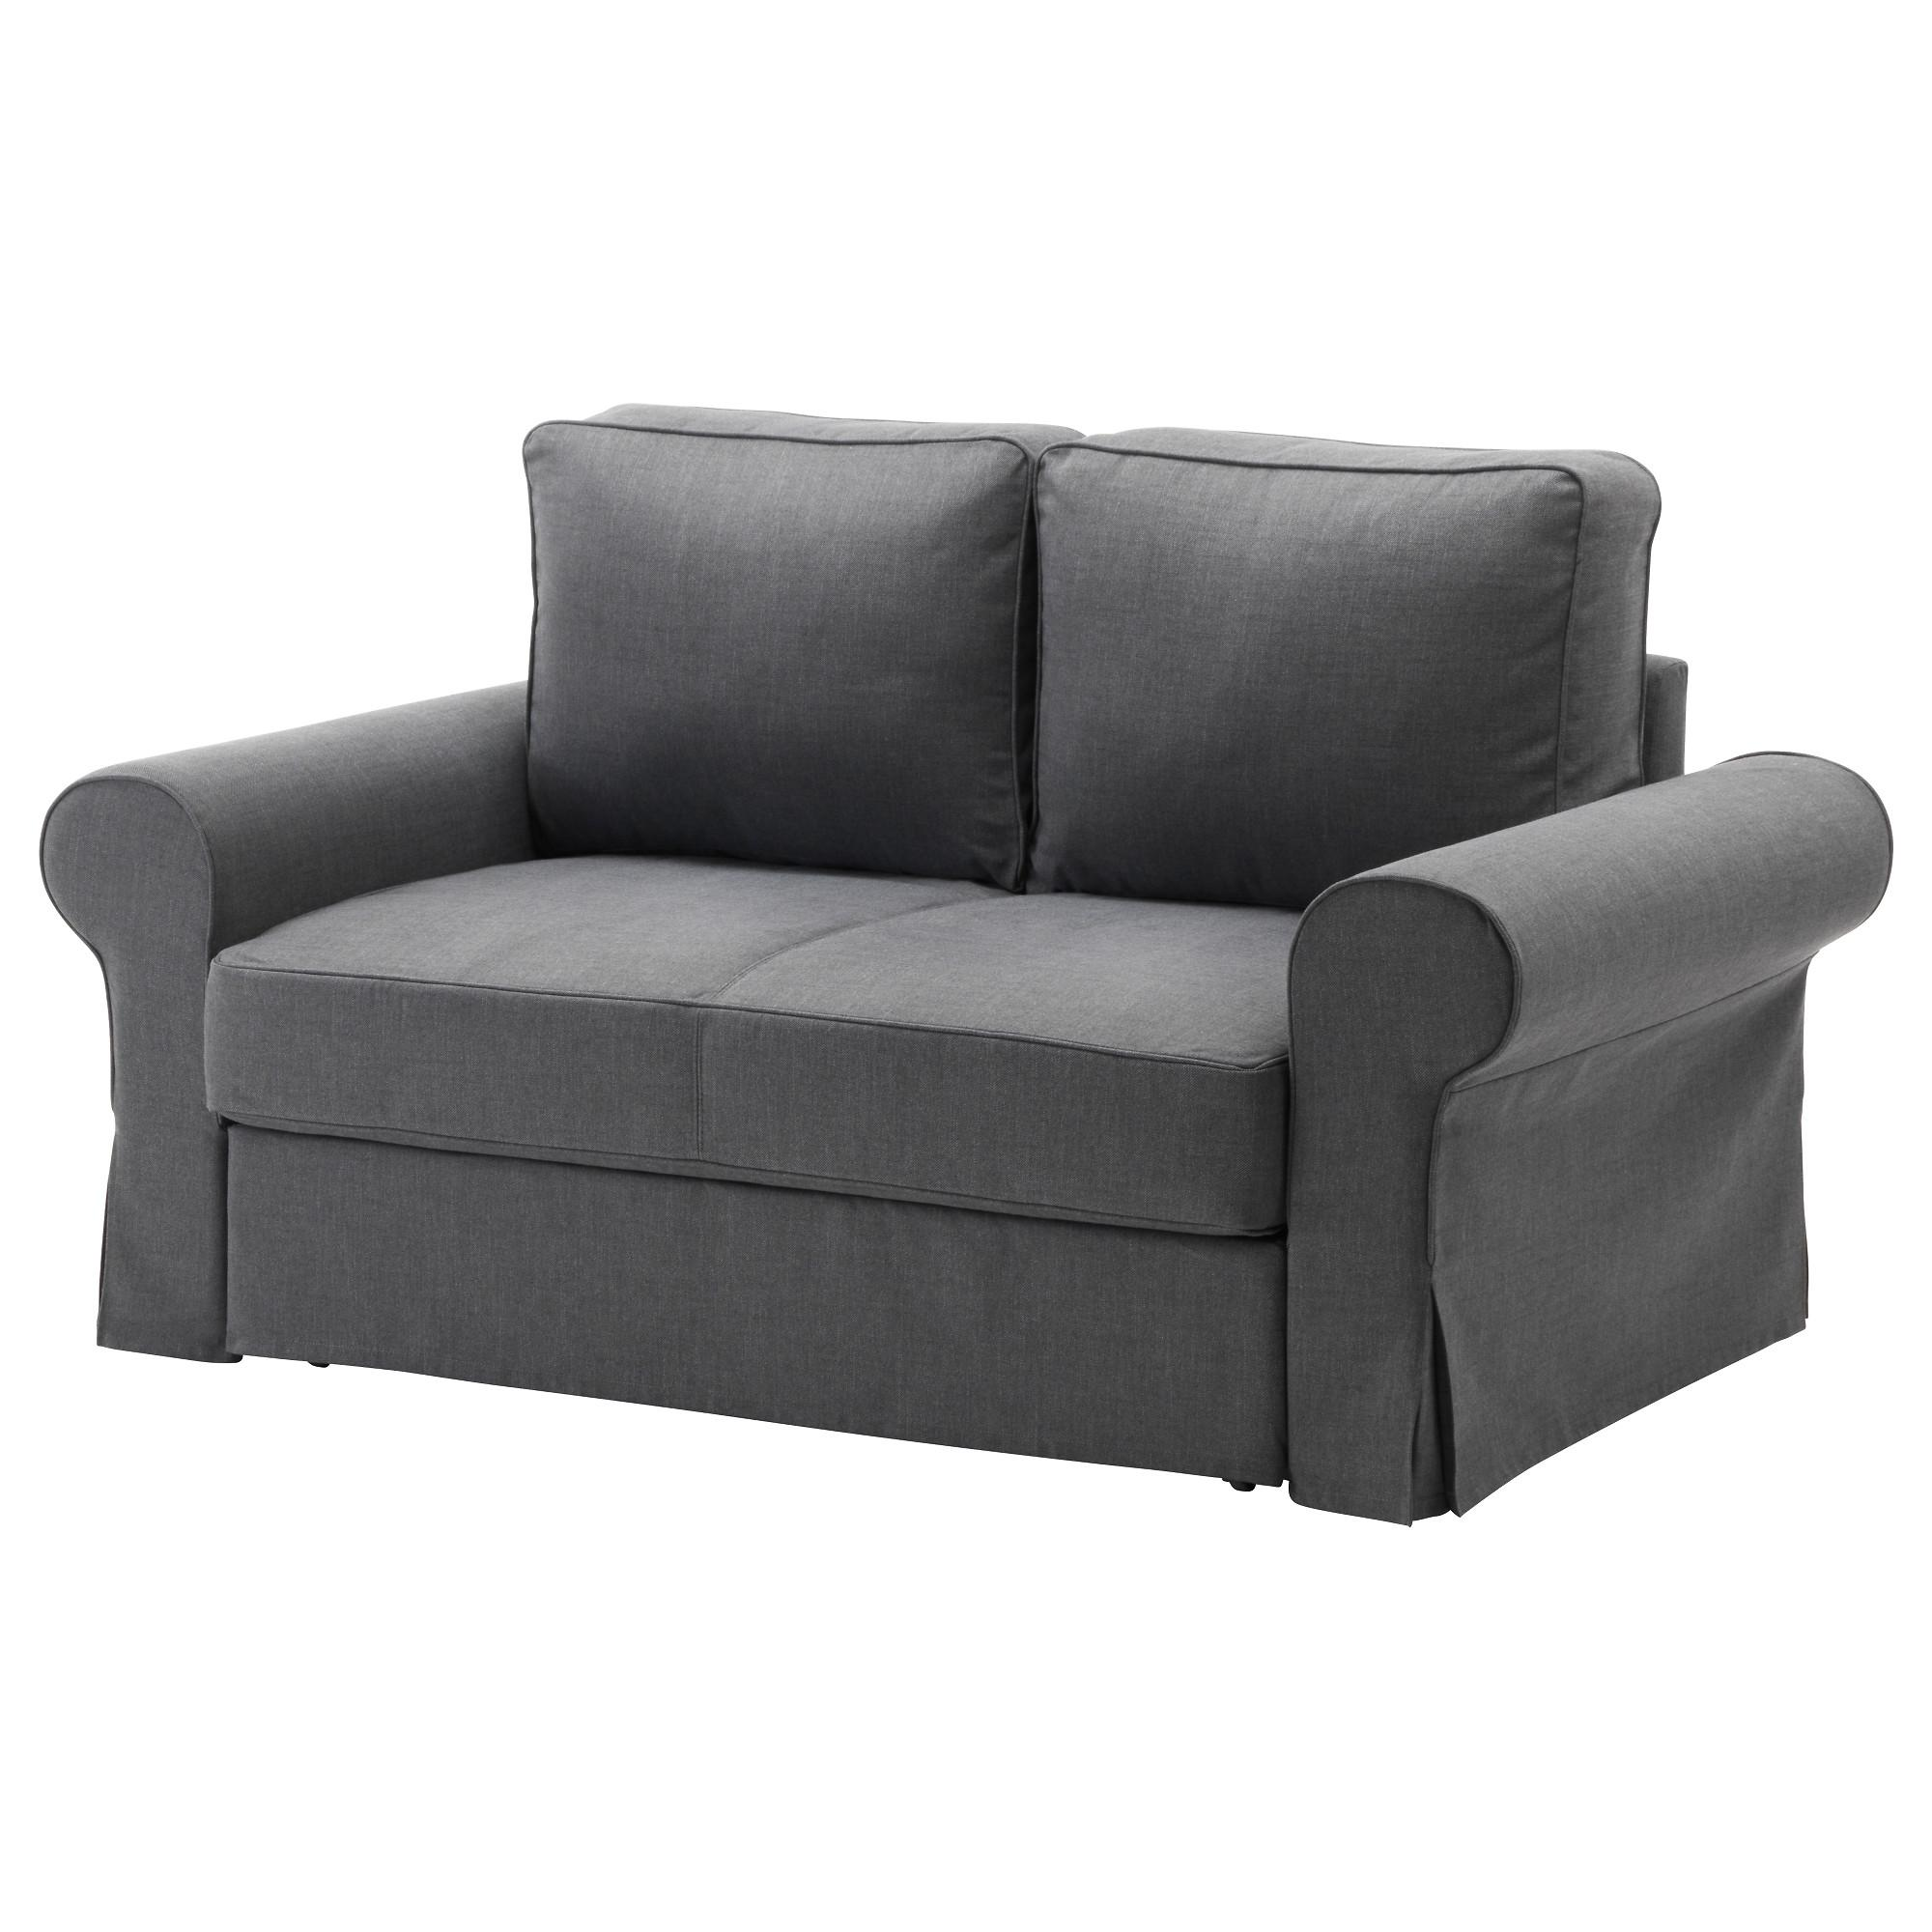 Ikea canapé lit